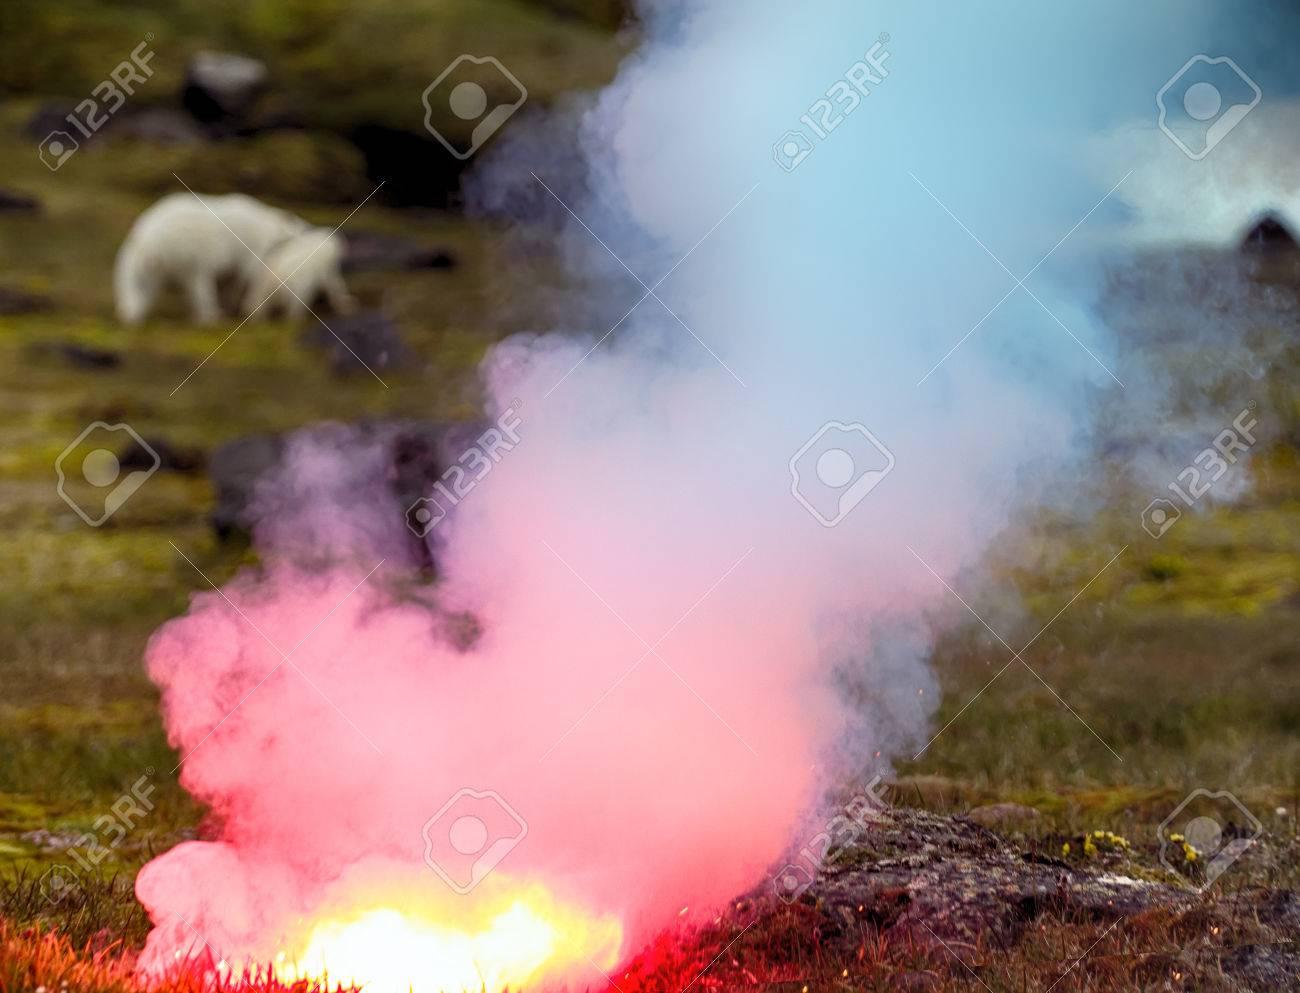 Polar bear (ice bear, Ursus maritimus) attacked photographer